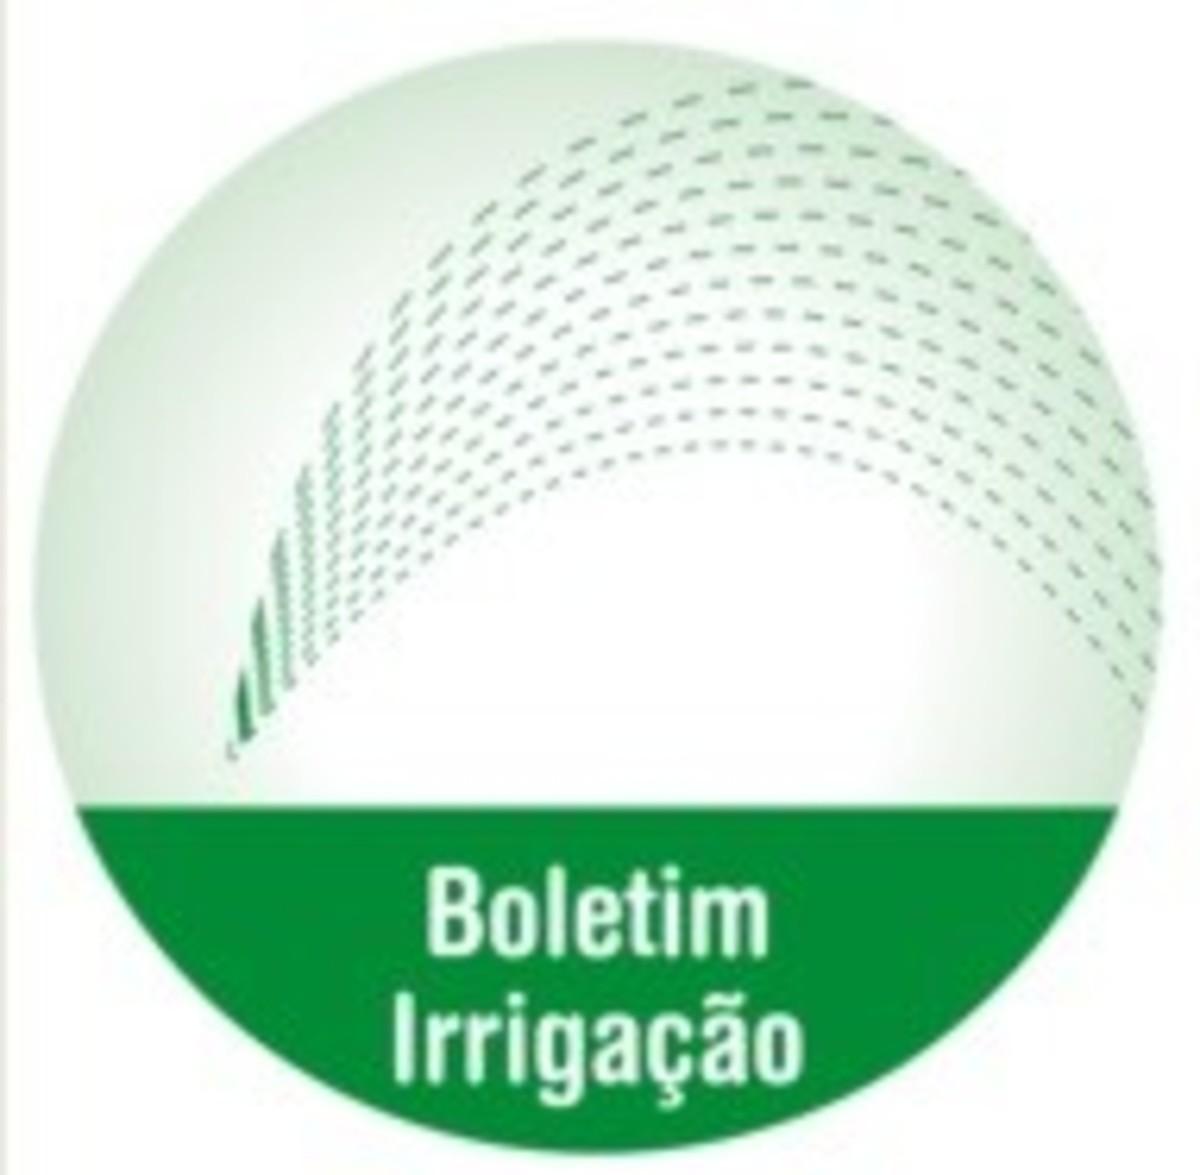 Medium texto boletim irrigacao1